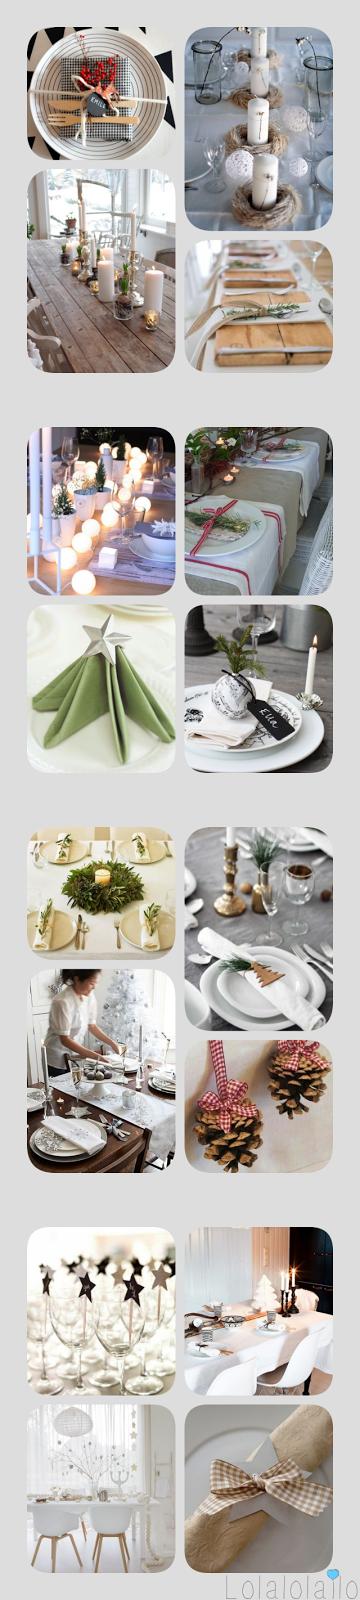 Lolalolailo blog ideas para decorar tu casa en navidad - Decorar mesa navidad manualidades ...